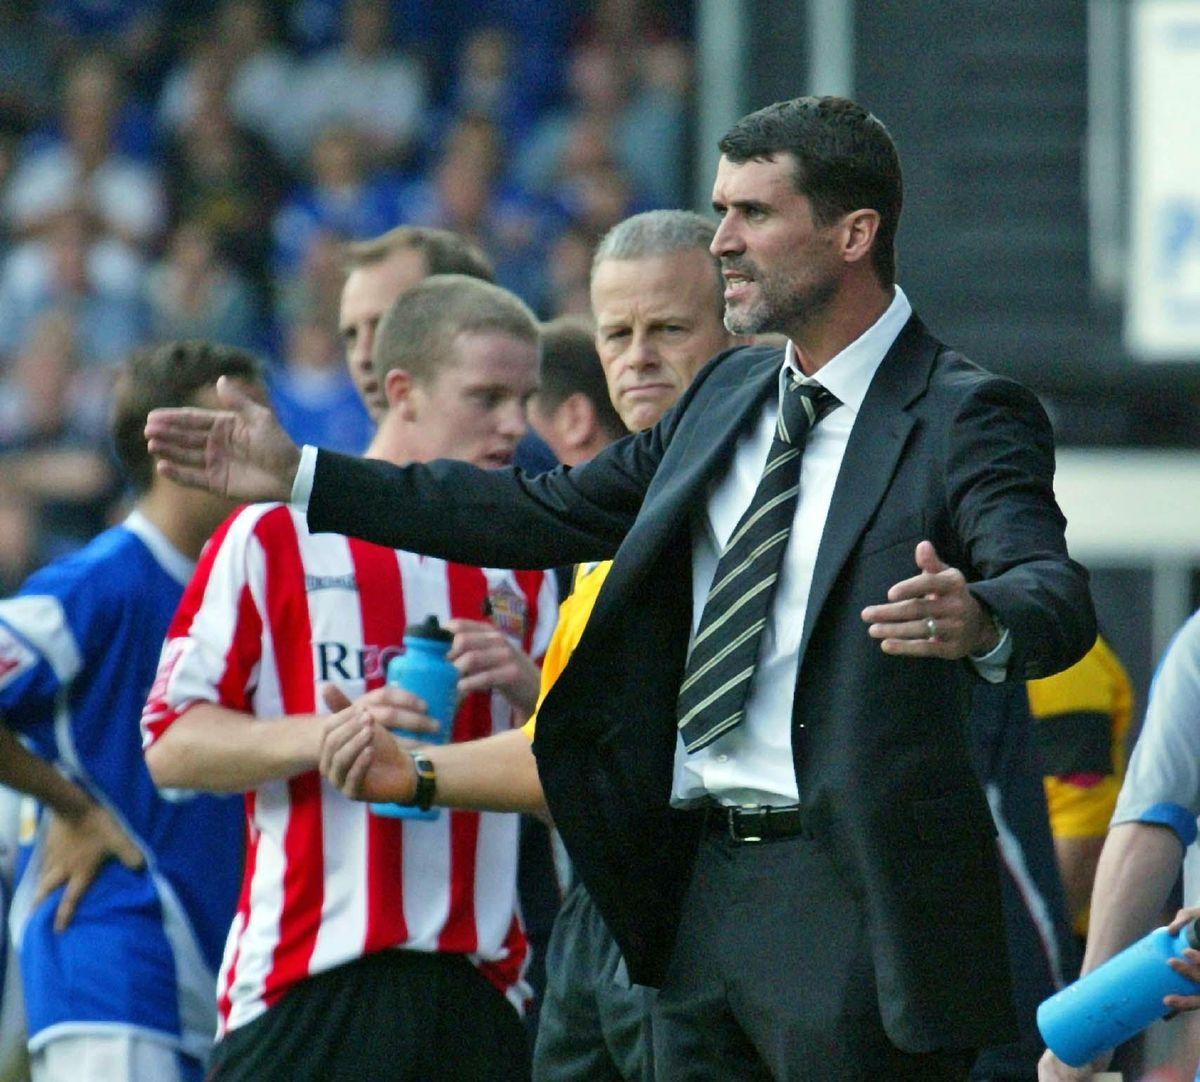 Soccer - Coca-Cola Championship match - Ipswich v Sunderland.